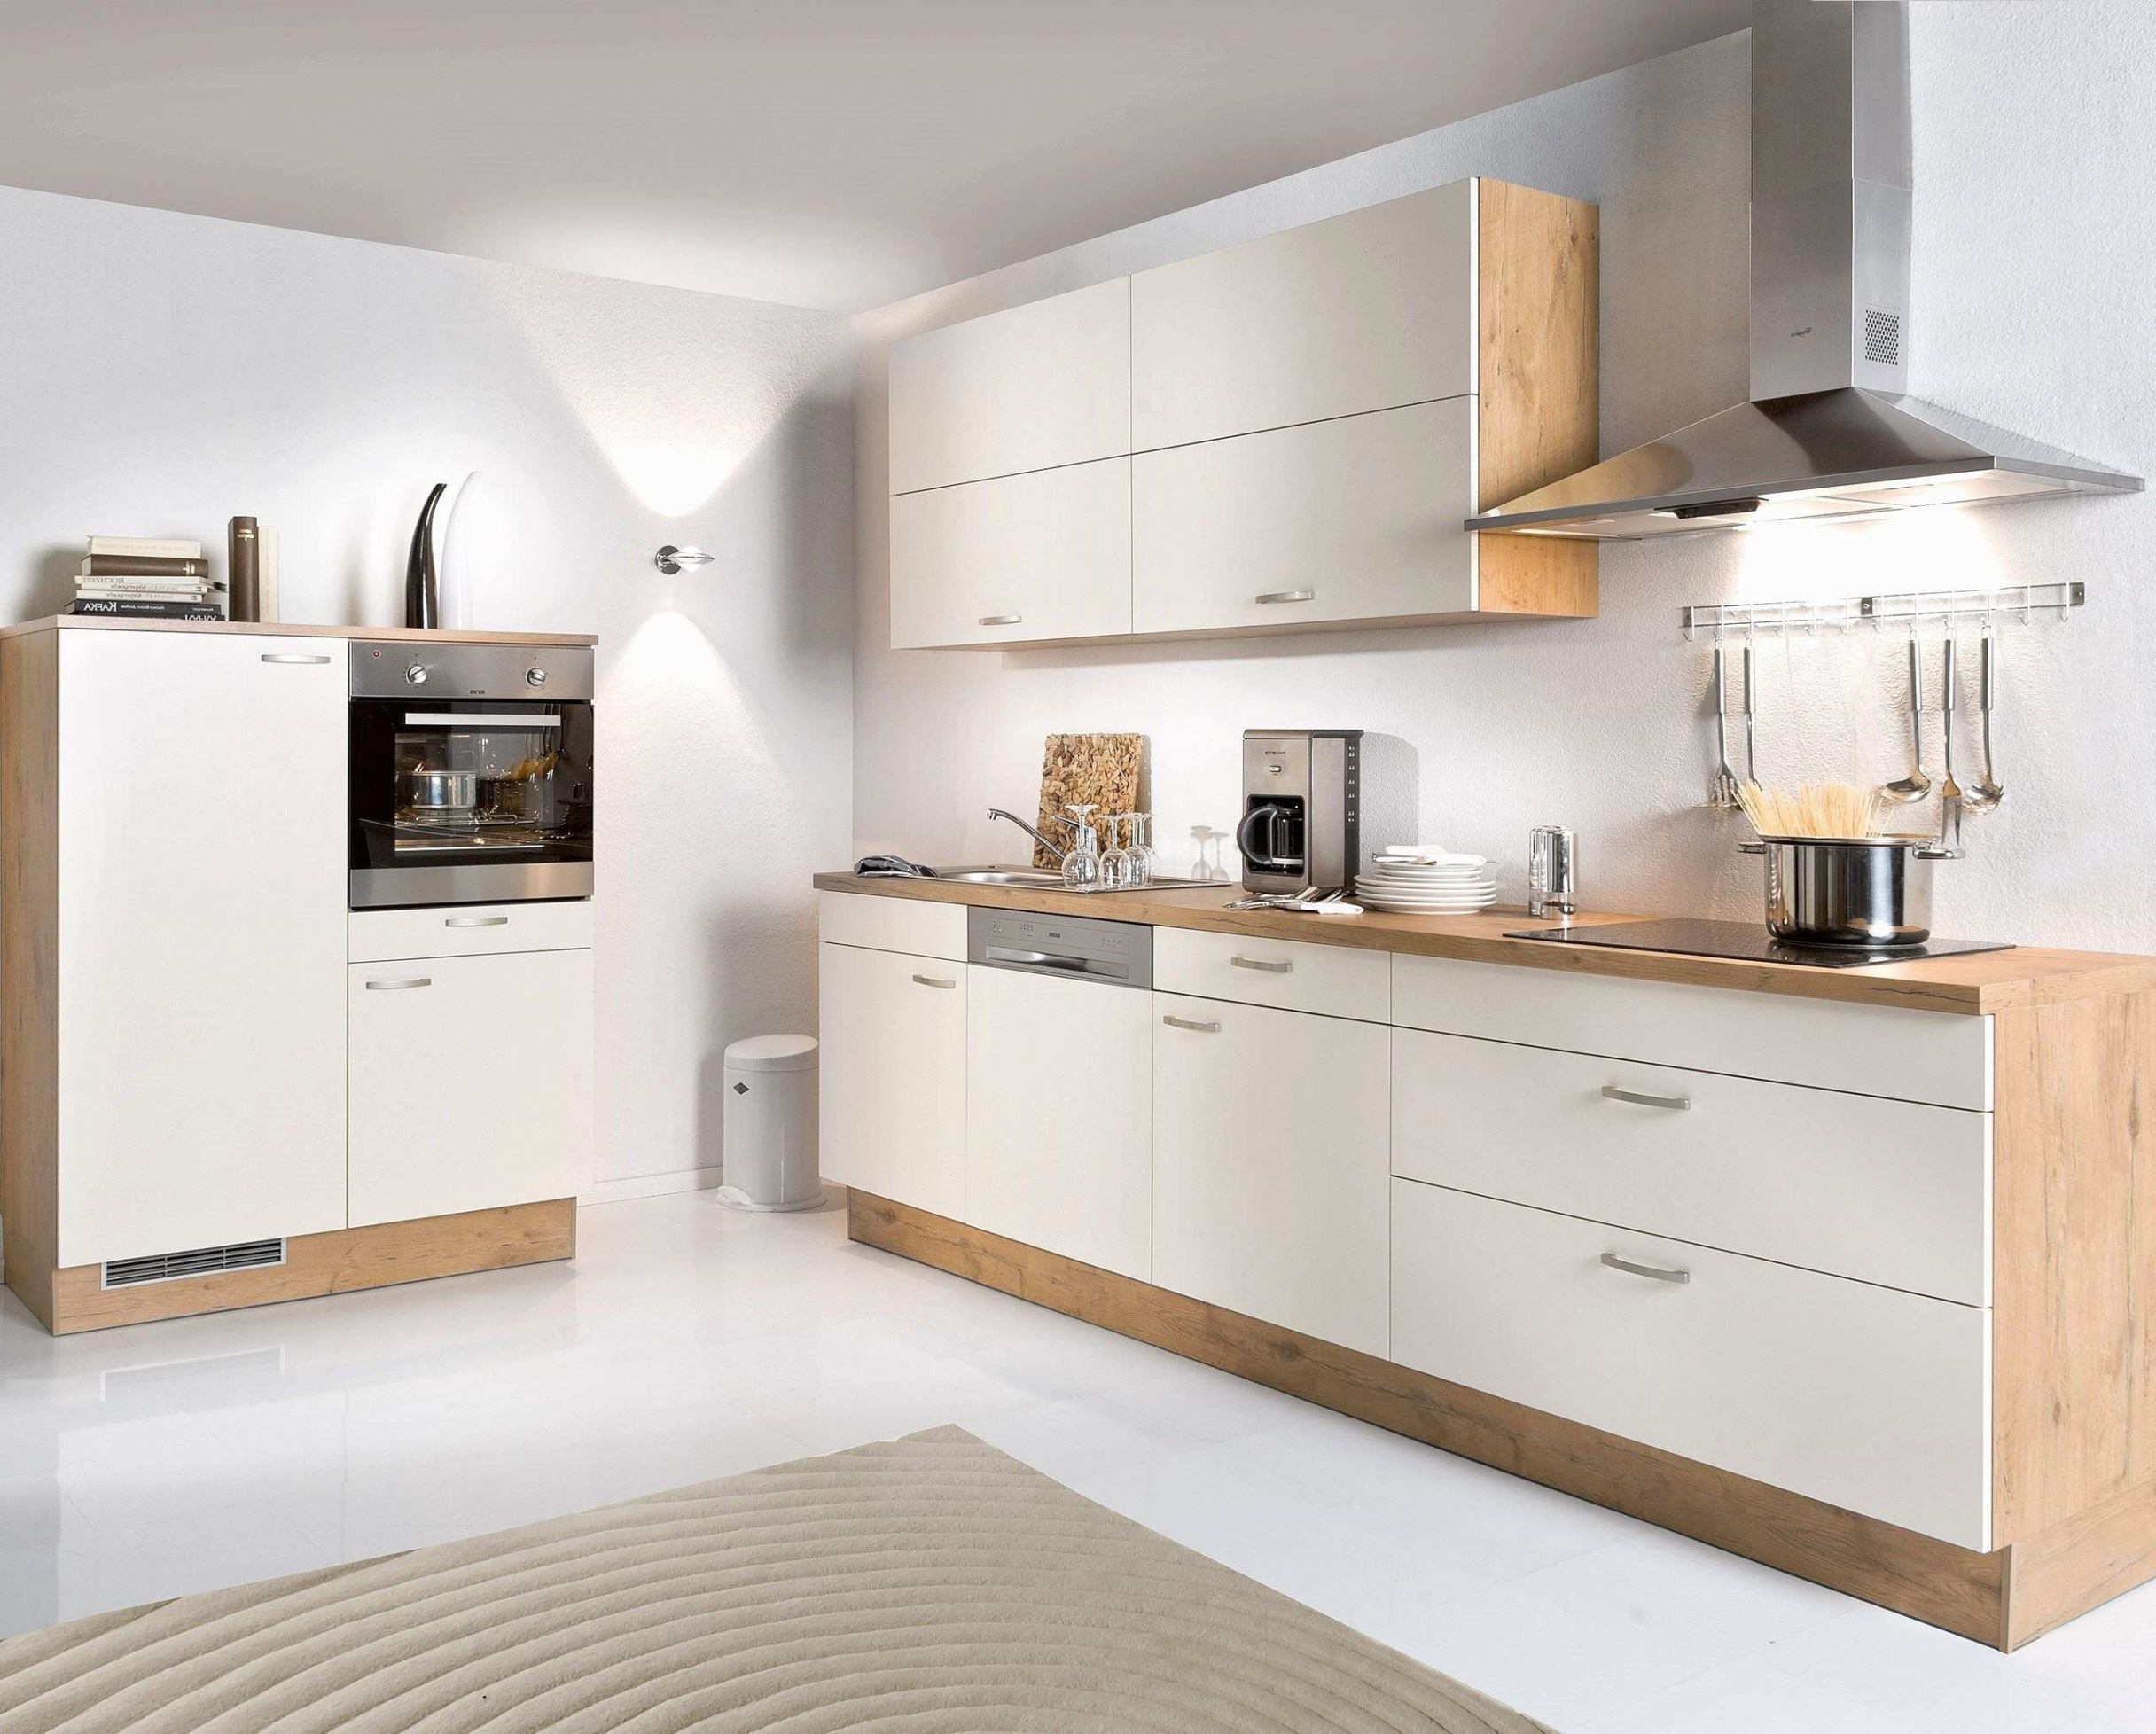 Full Size of Küche Arbeitsplatte Granit Ikea Schrankgriffe Küche Planen Tablet   Granit Arbeitsplatte Erfahrungen Küche Küche Selber Planen